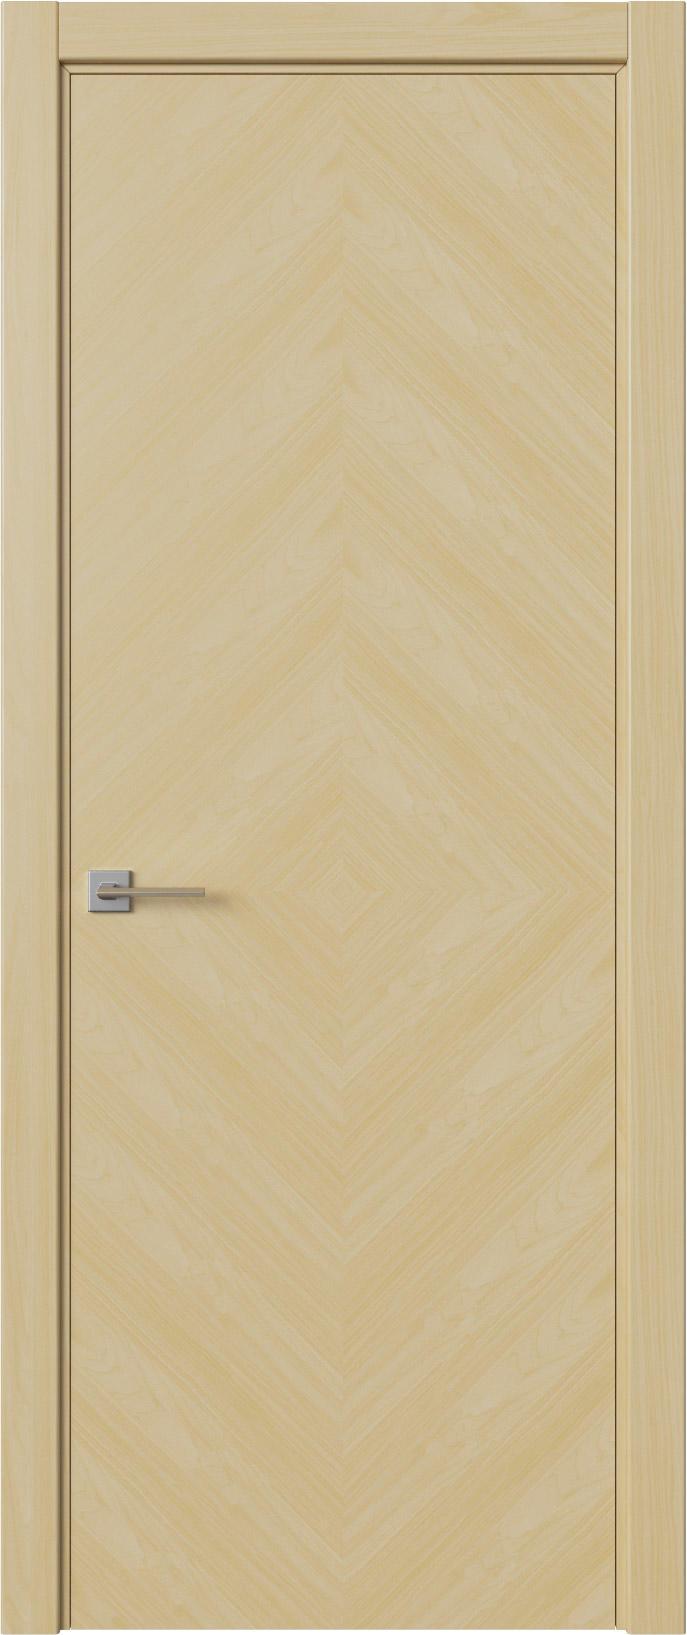 Tivoli К-1 цвет - Дуб нордик Без стекла (ДГ)